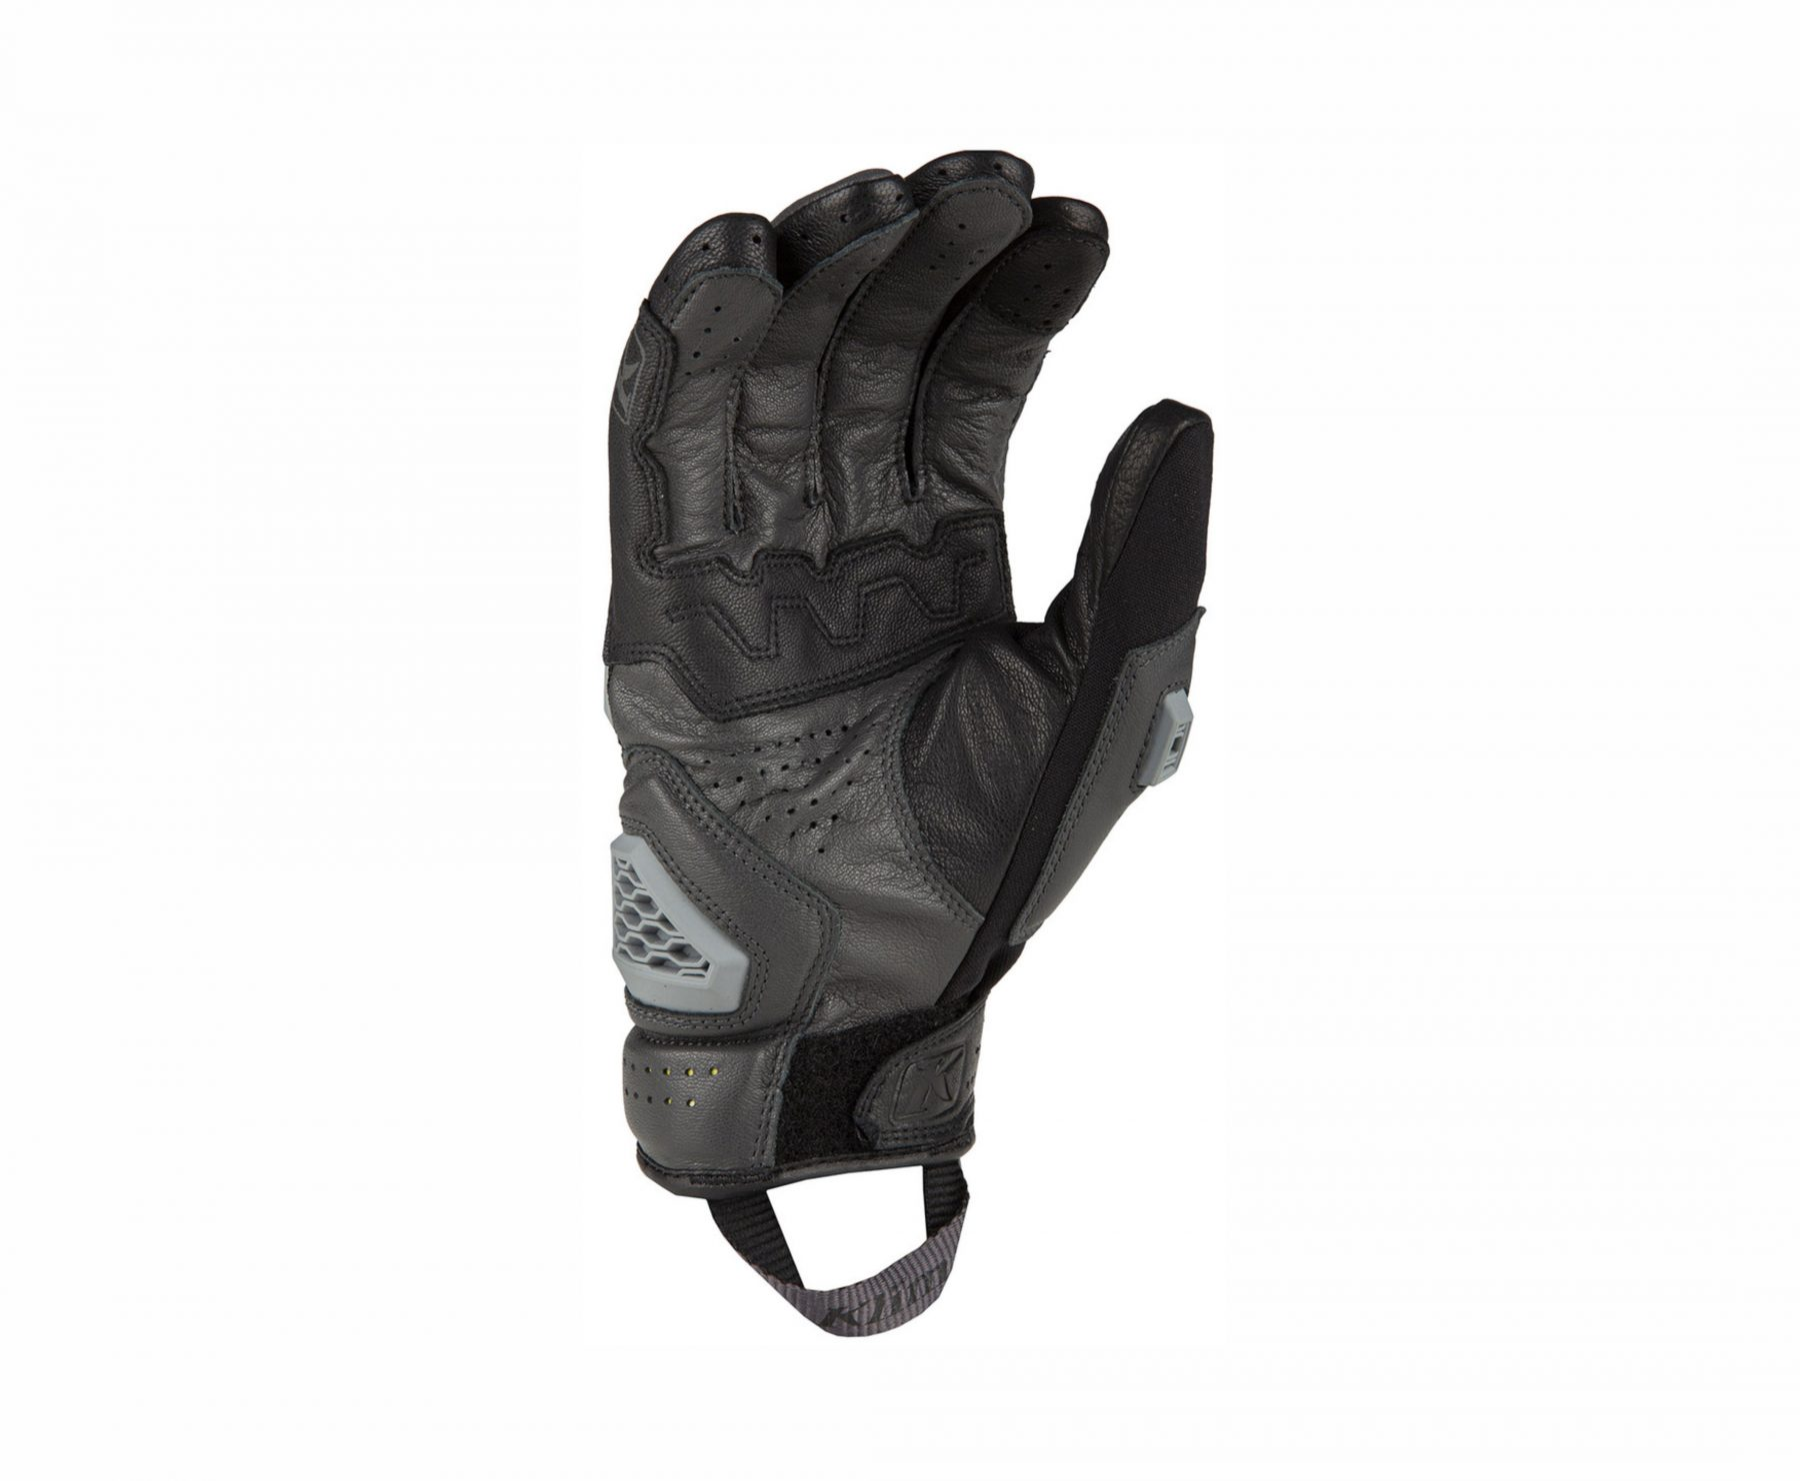 KLIM-New-Baja-S4-gloves 2b